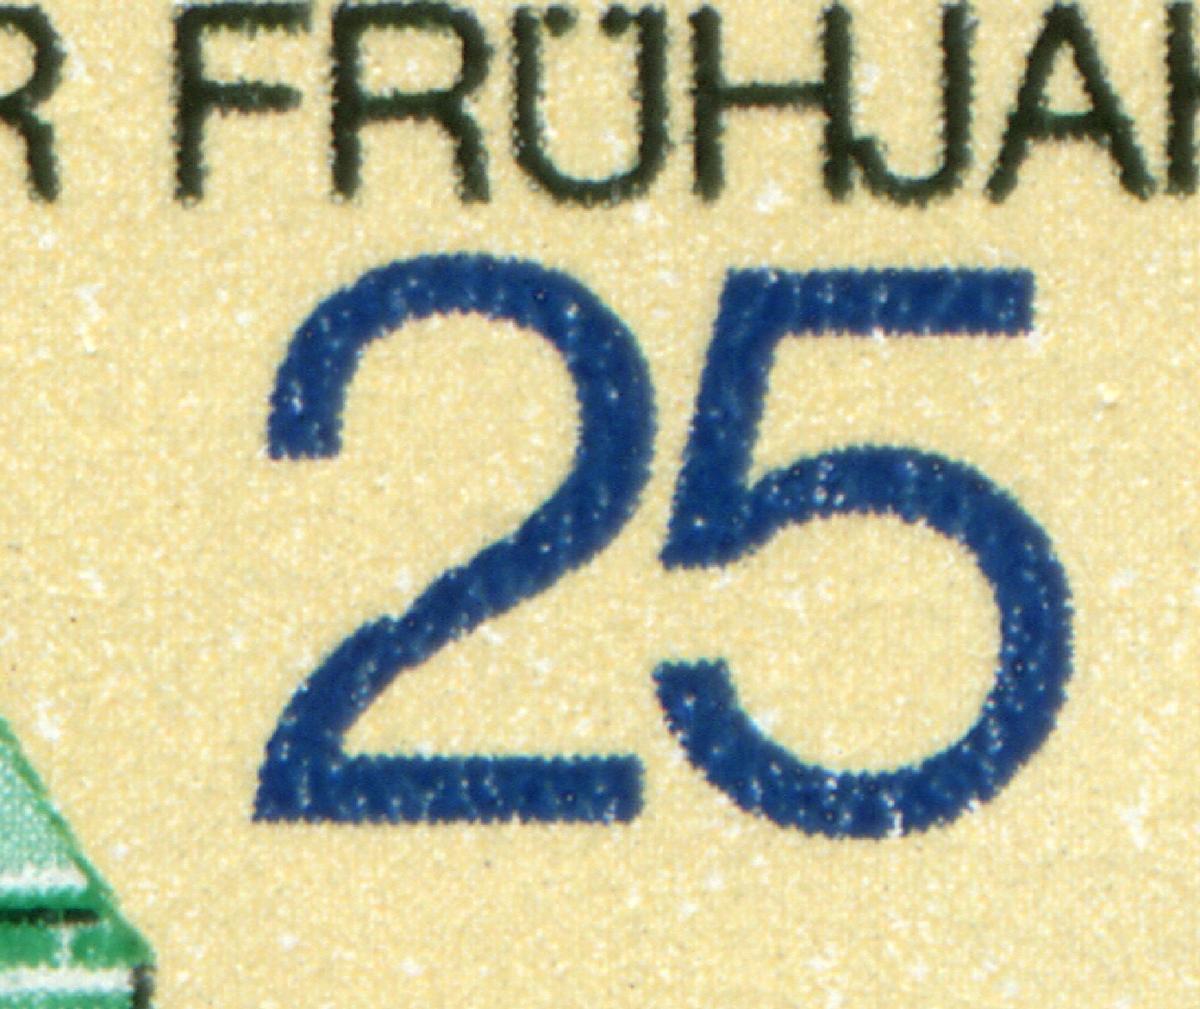 2209 Messe Leipzig 20 Pf mit PLF Kerbe in der 2, Feld 12, ** 0